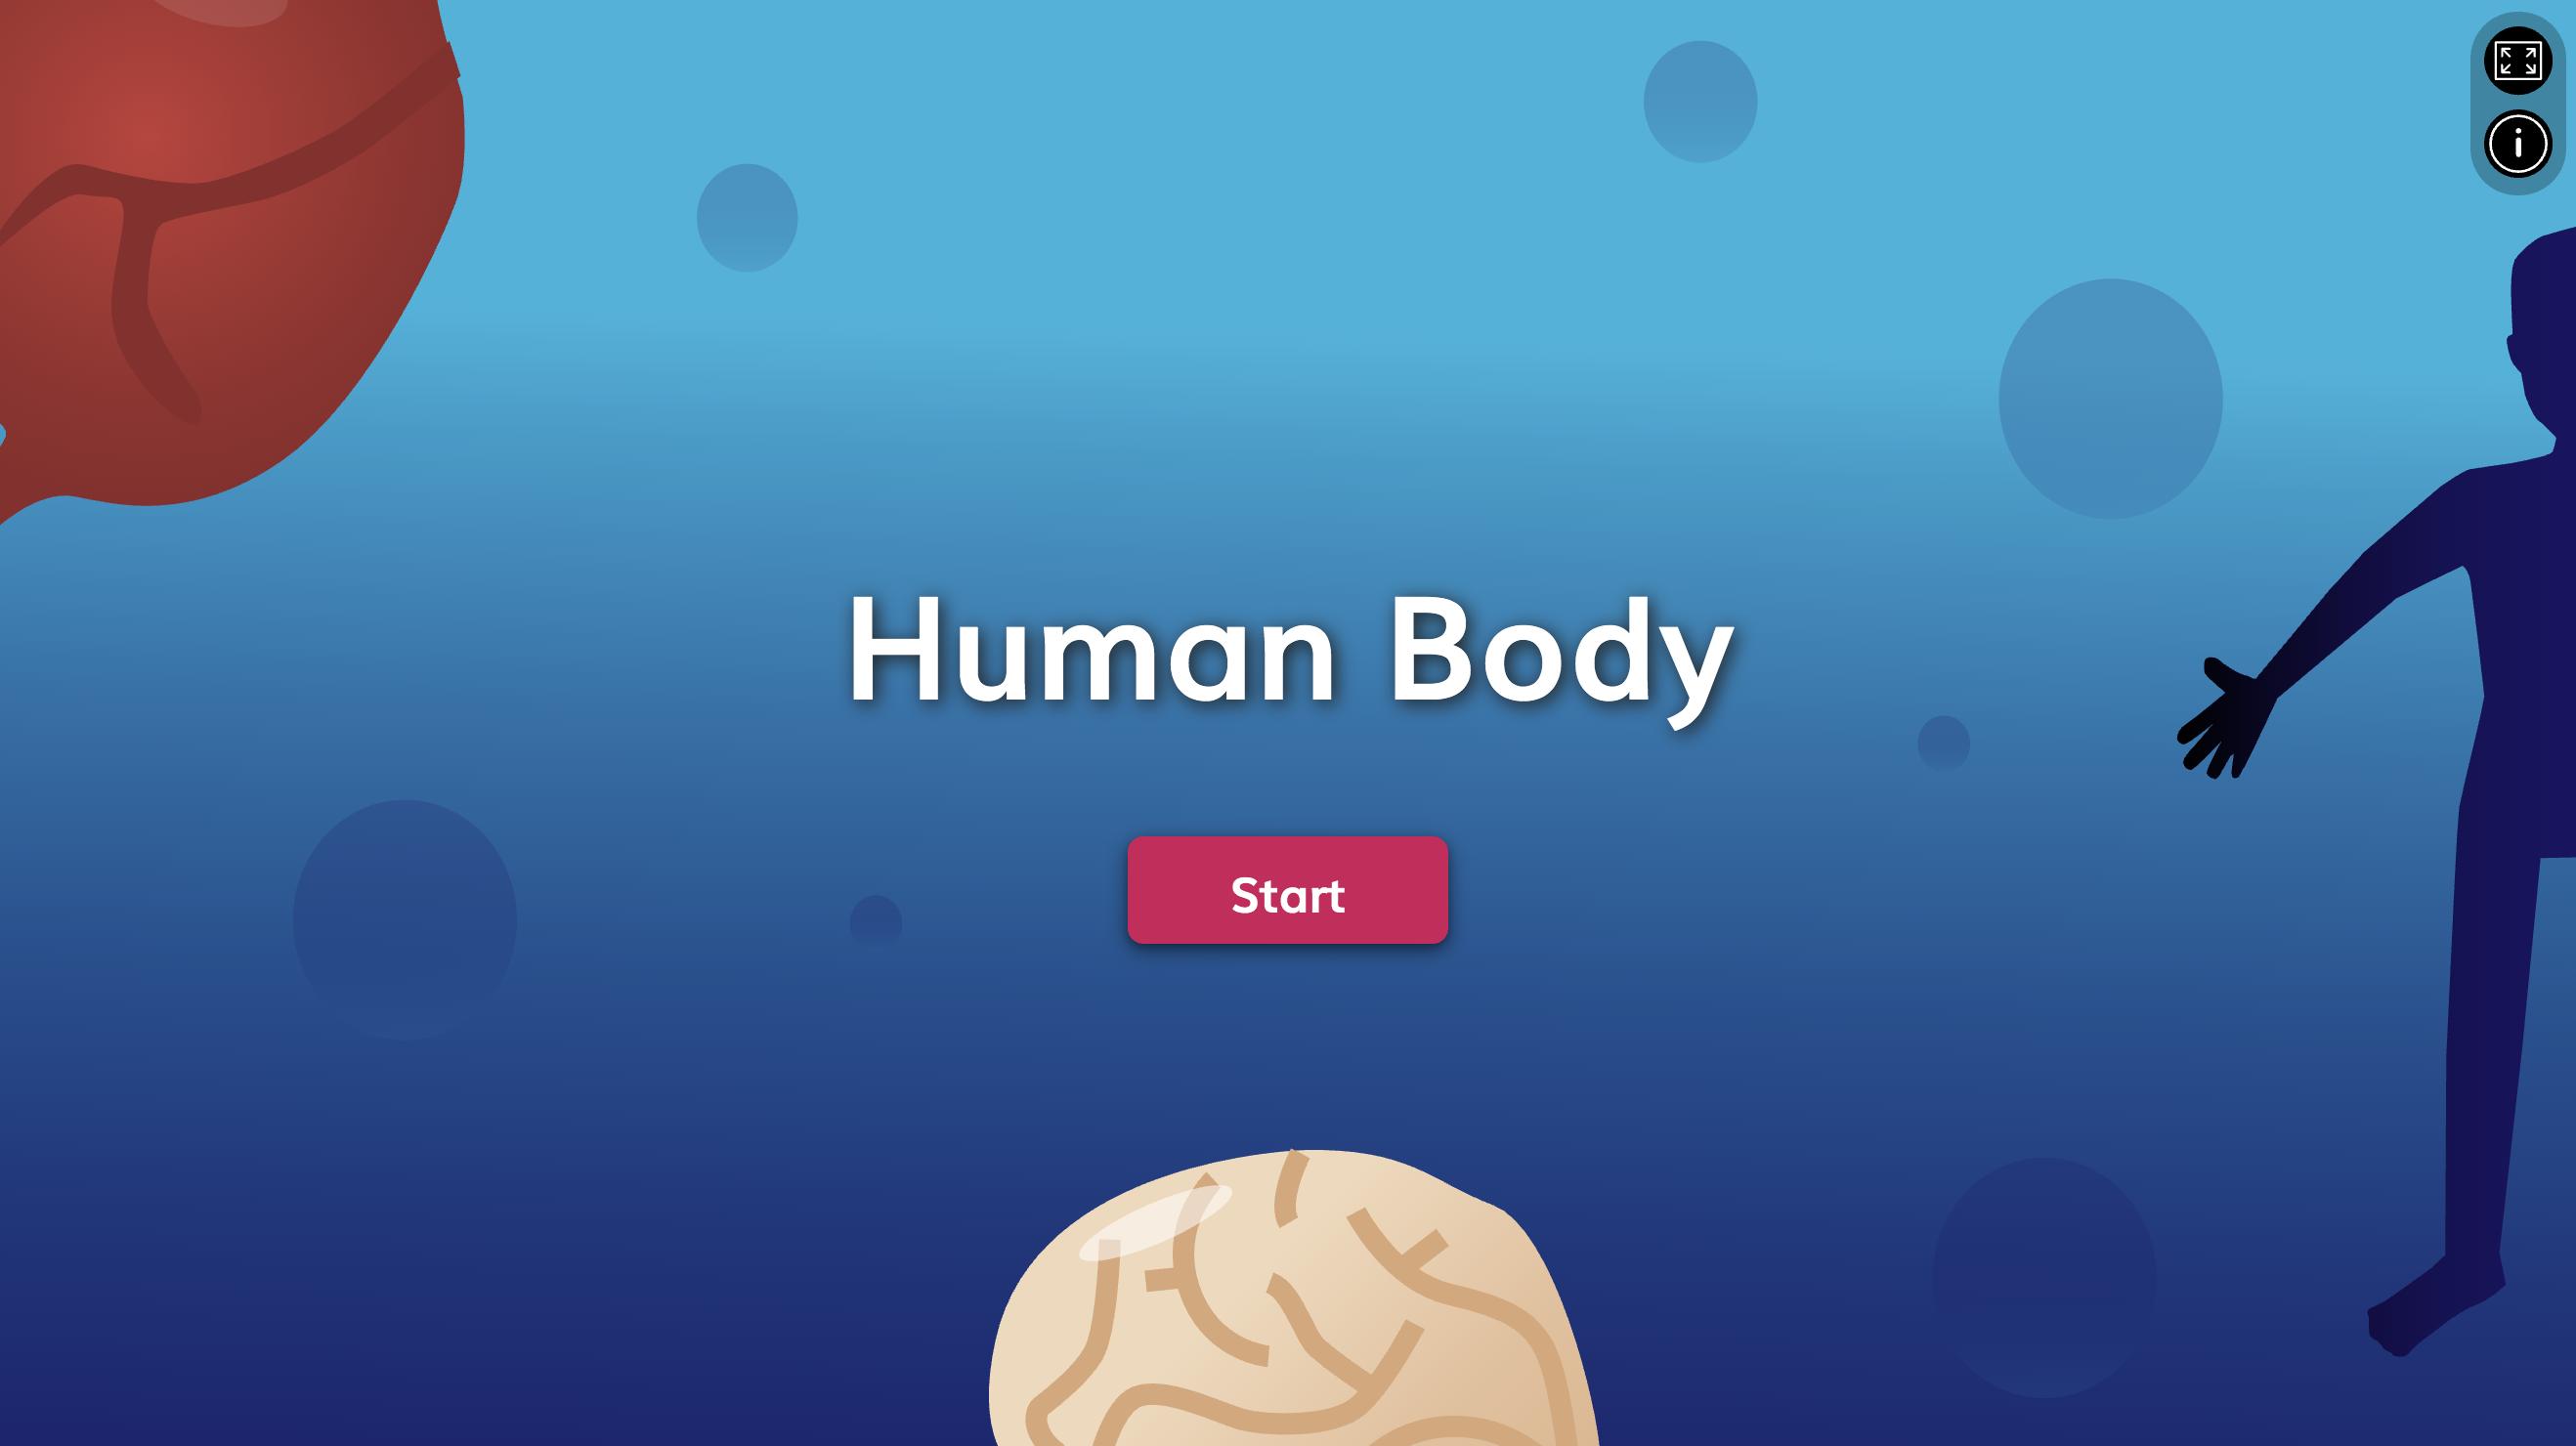 Build a Human interactive